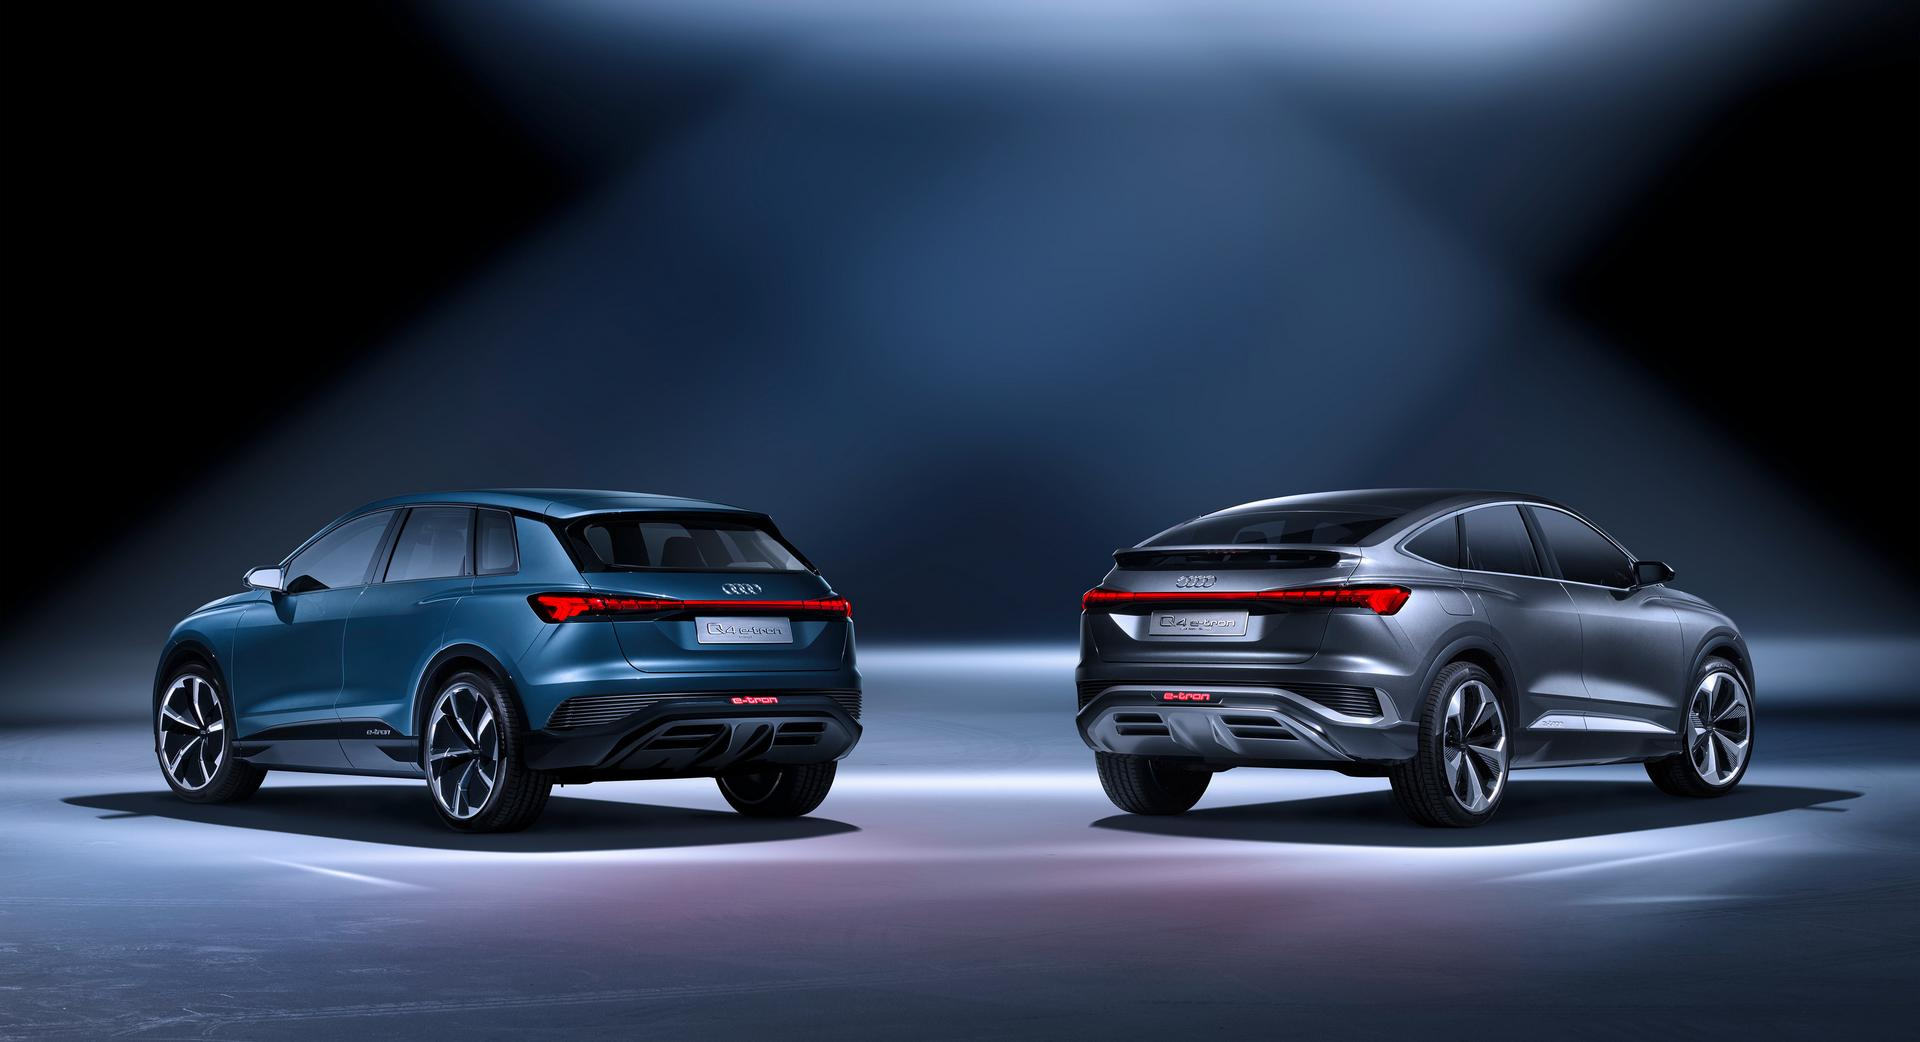 Audi Q4 e-tron concept / Audi Q4 Sportback and SUV